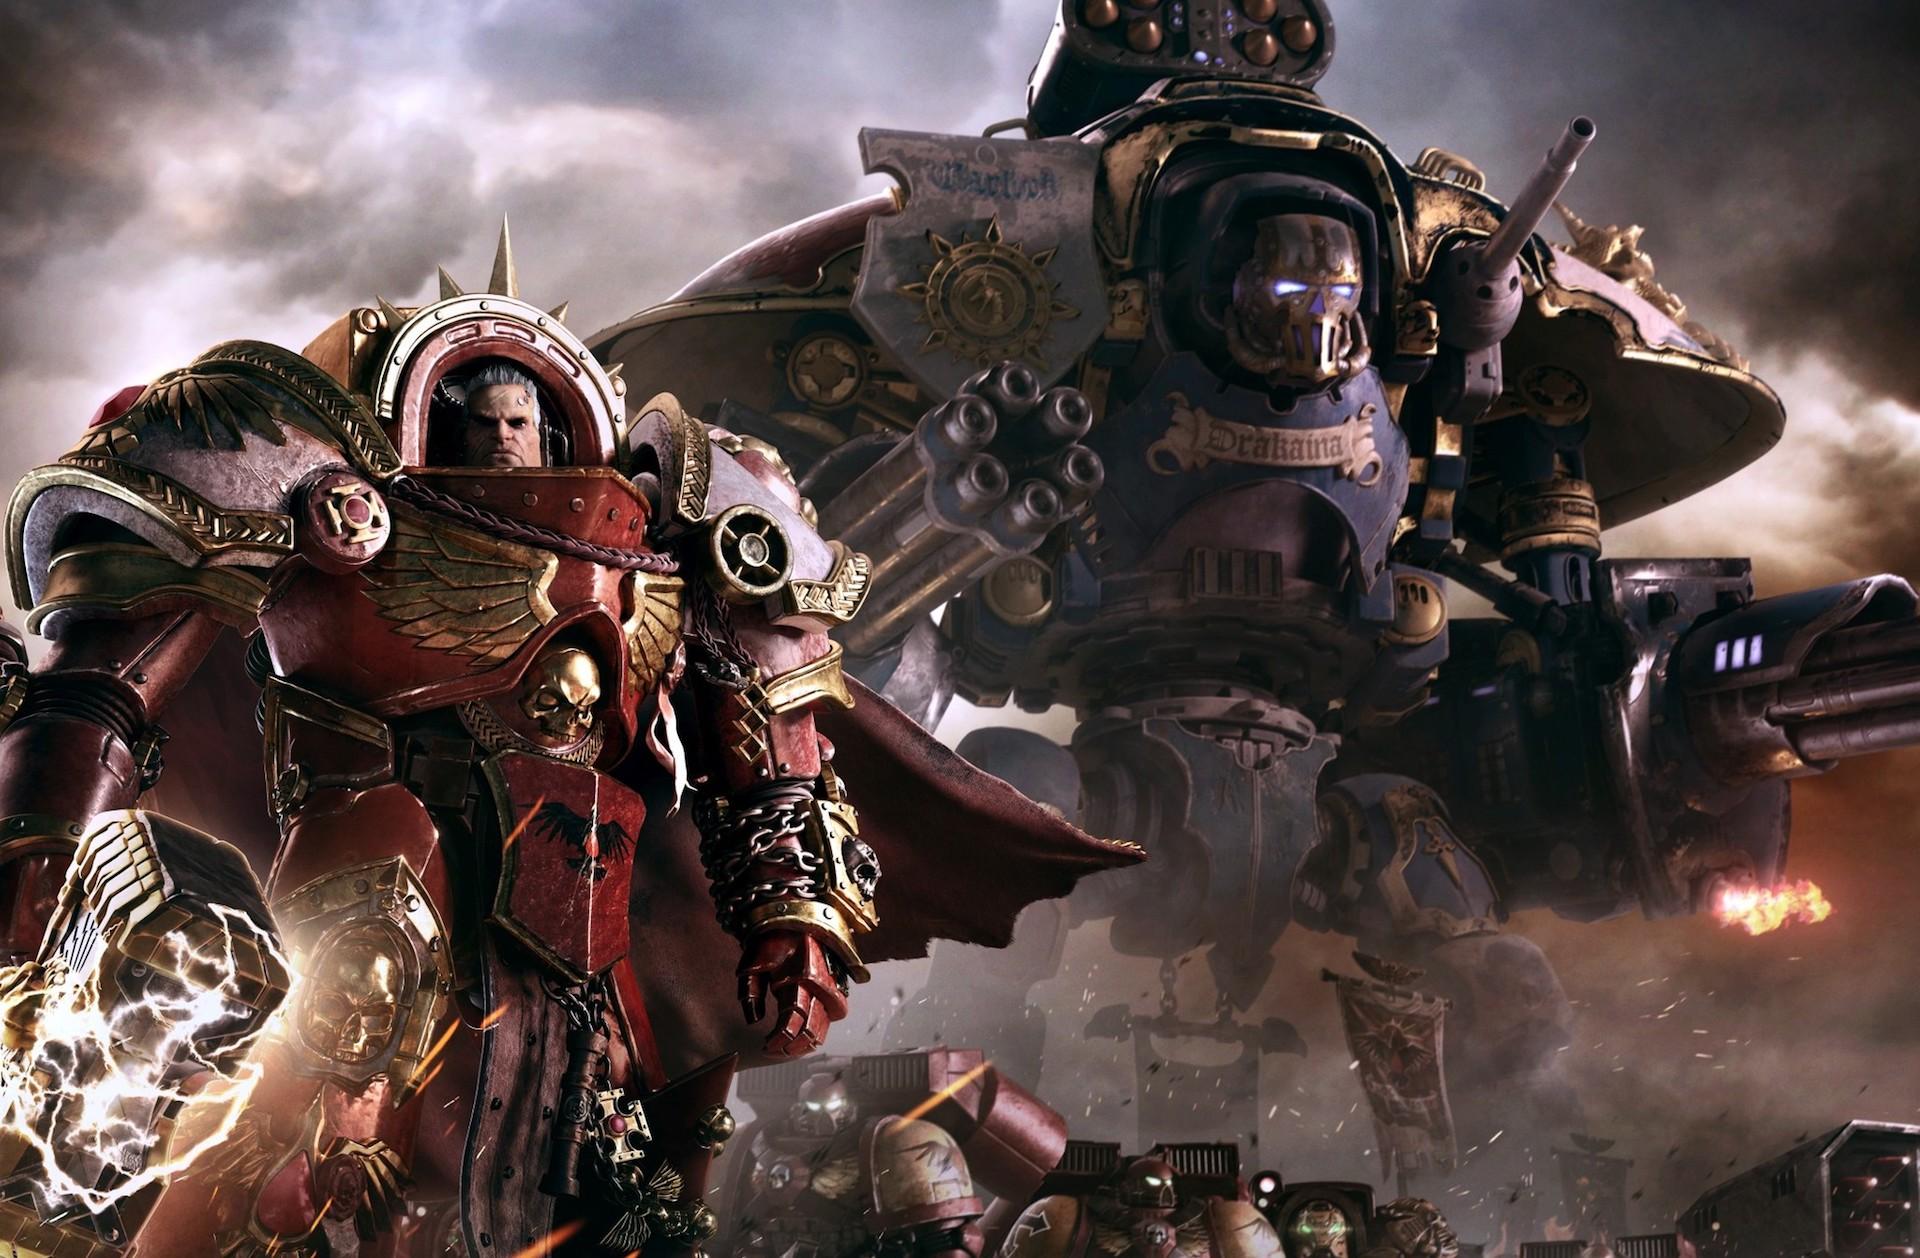 Nuovo trailer di Warhammer 40,000: Dawn of War III